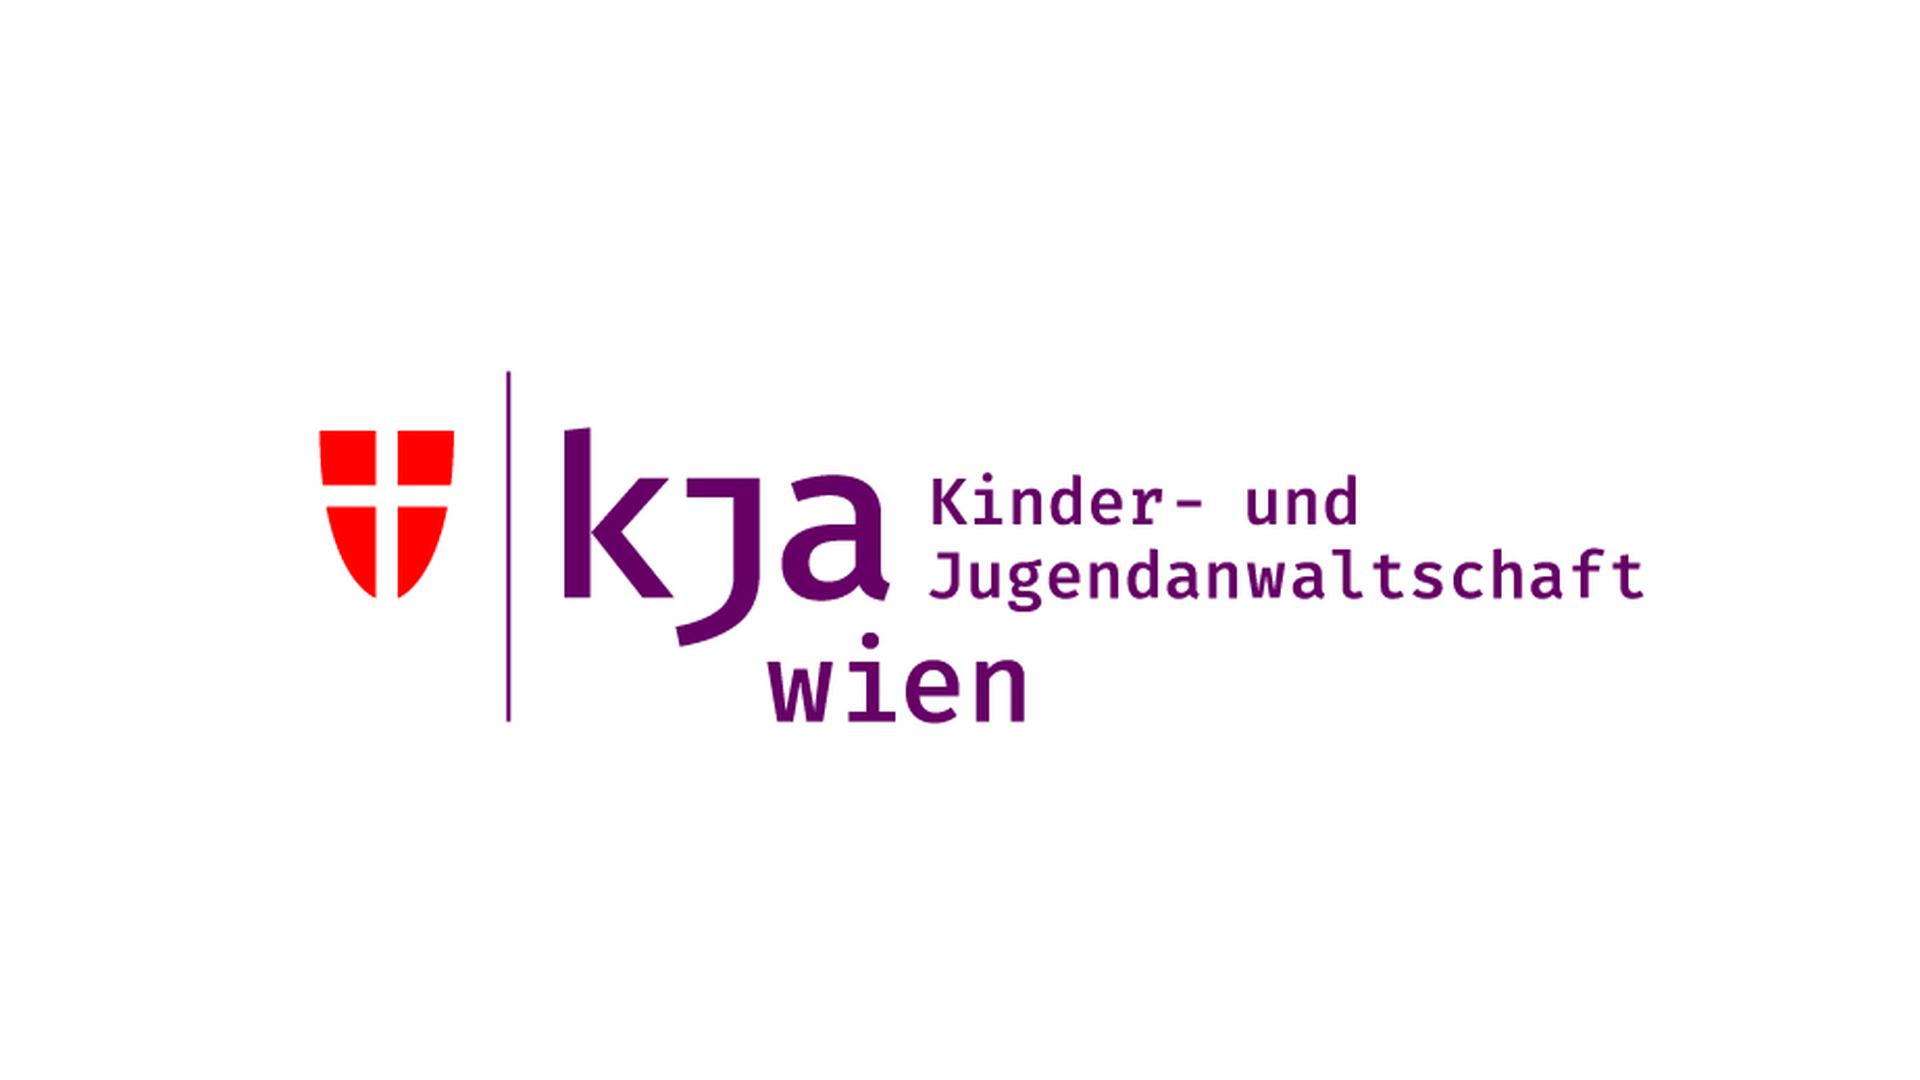 Logo-Kinder-Jugendanwaltschaft-Wien.png